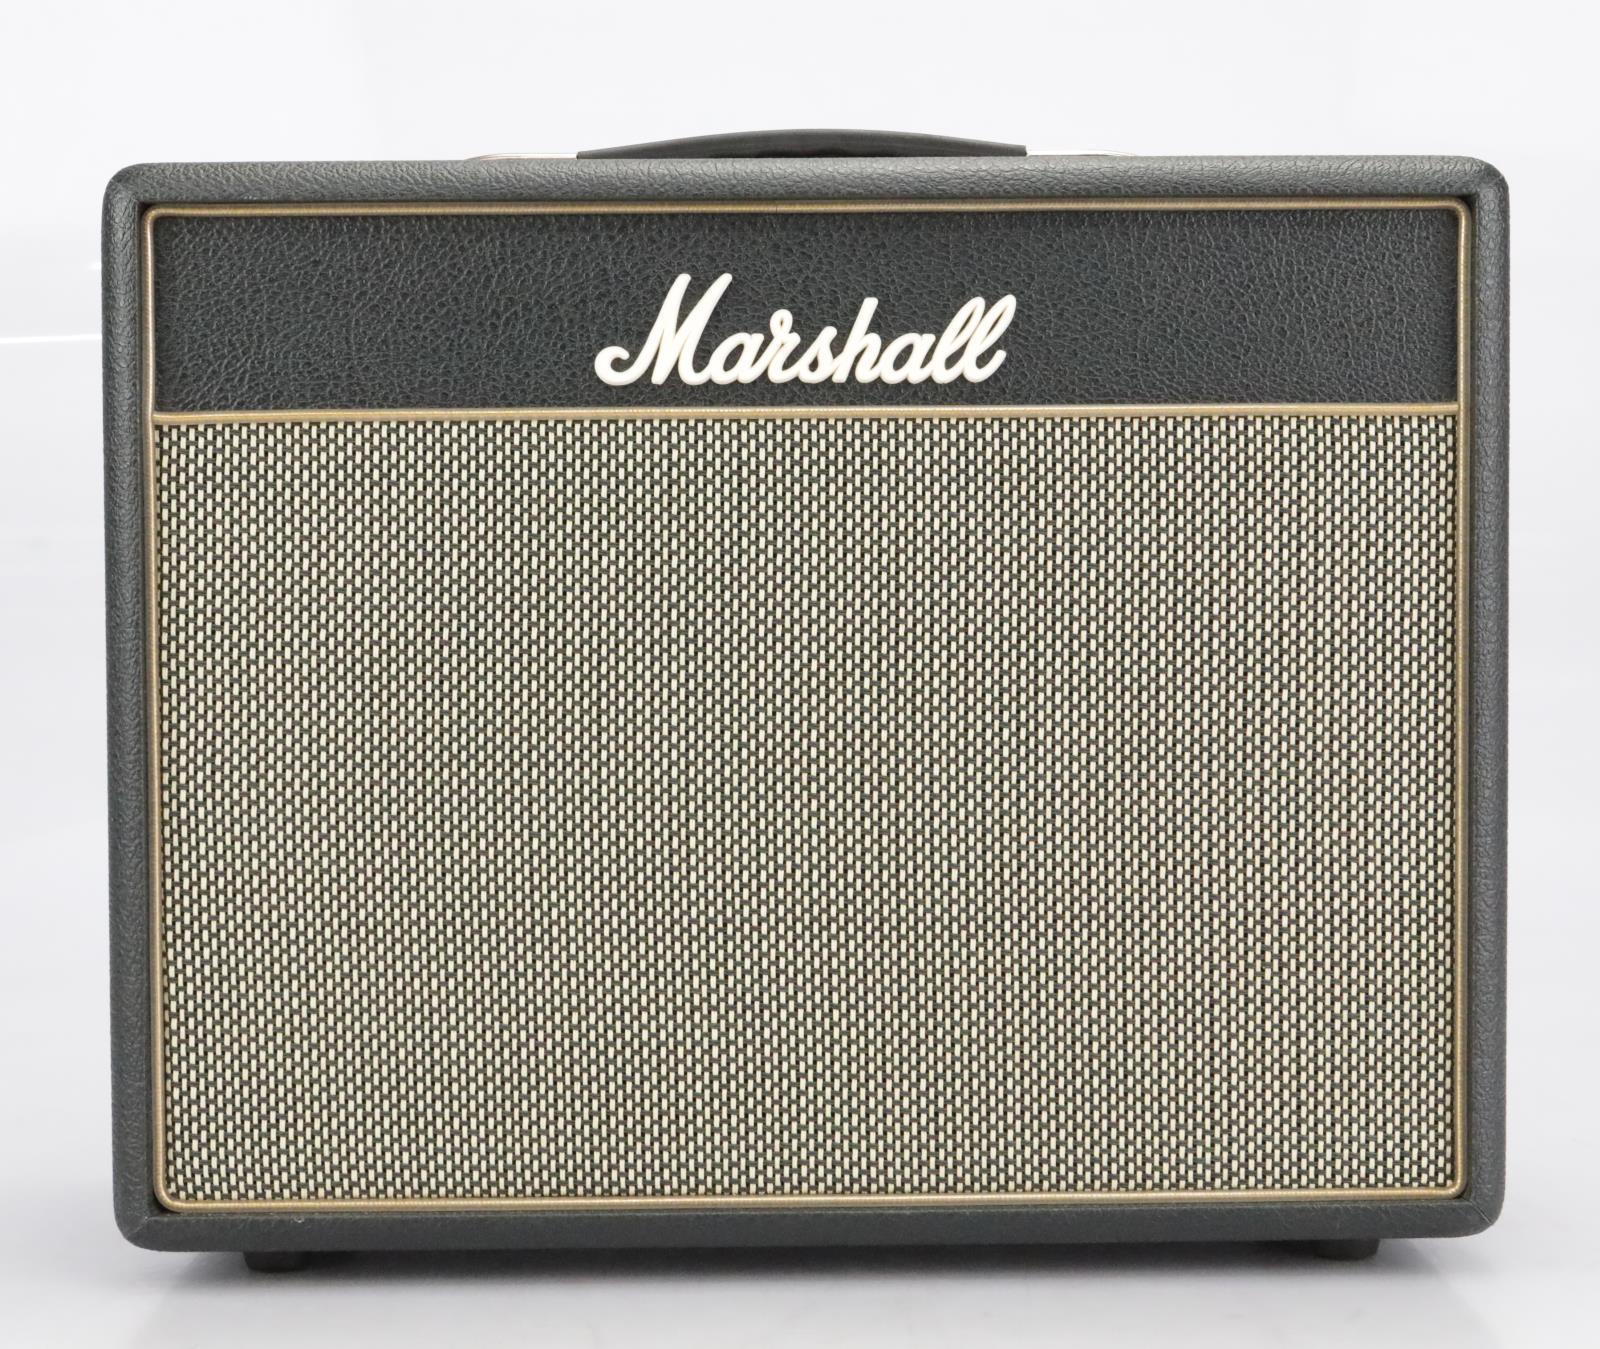 "Marshall Class 5 C5-01 1x10"" Combo Guitar Amplifier #41568"